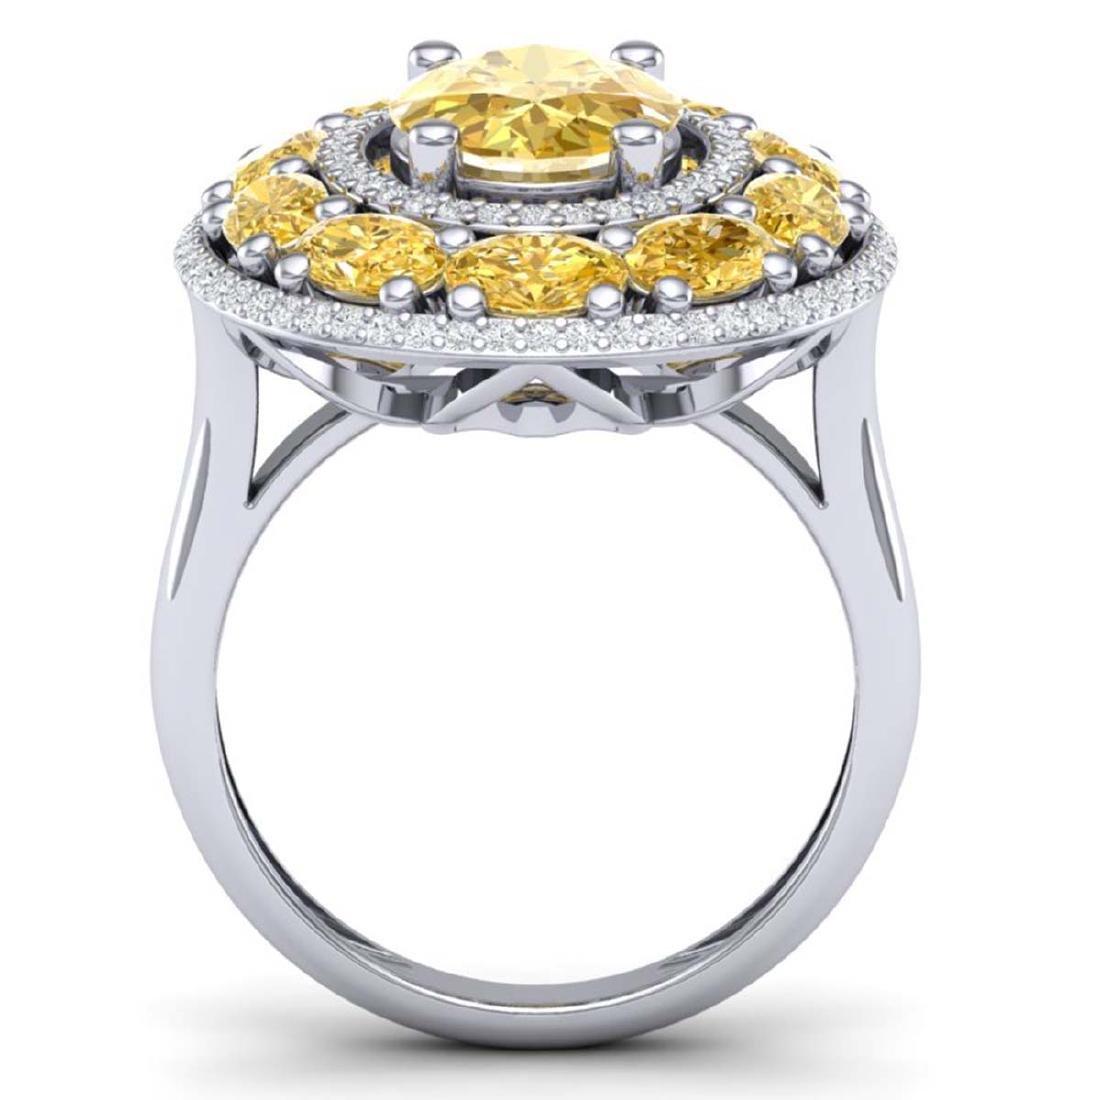 7.21 ctw Canary Citrine & VS Diamond Ring 18K White - 3